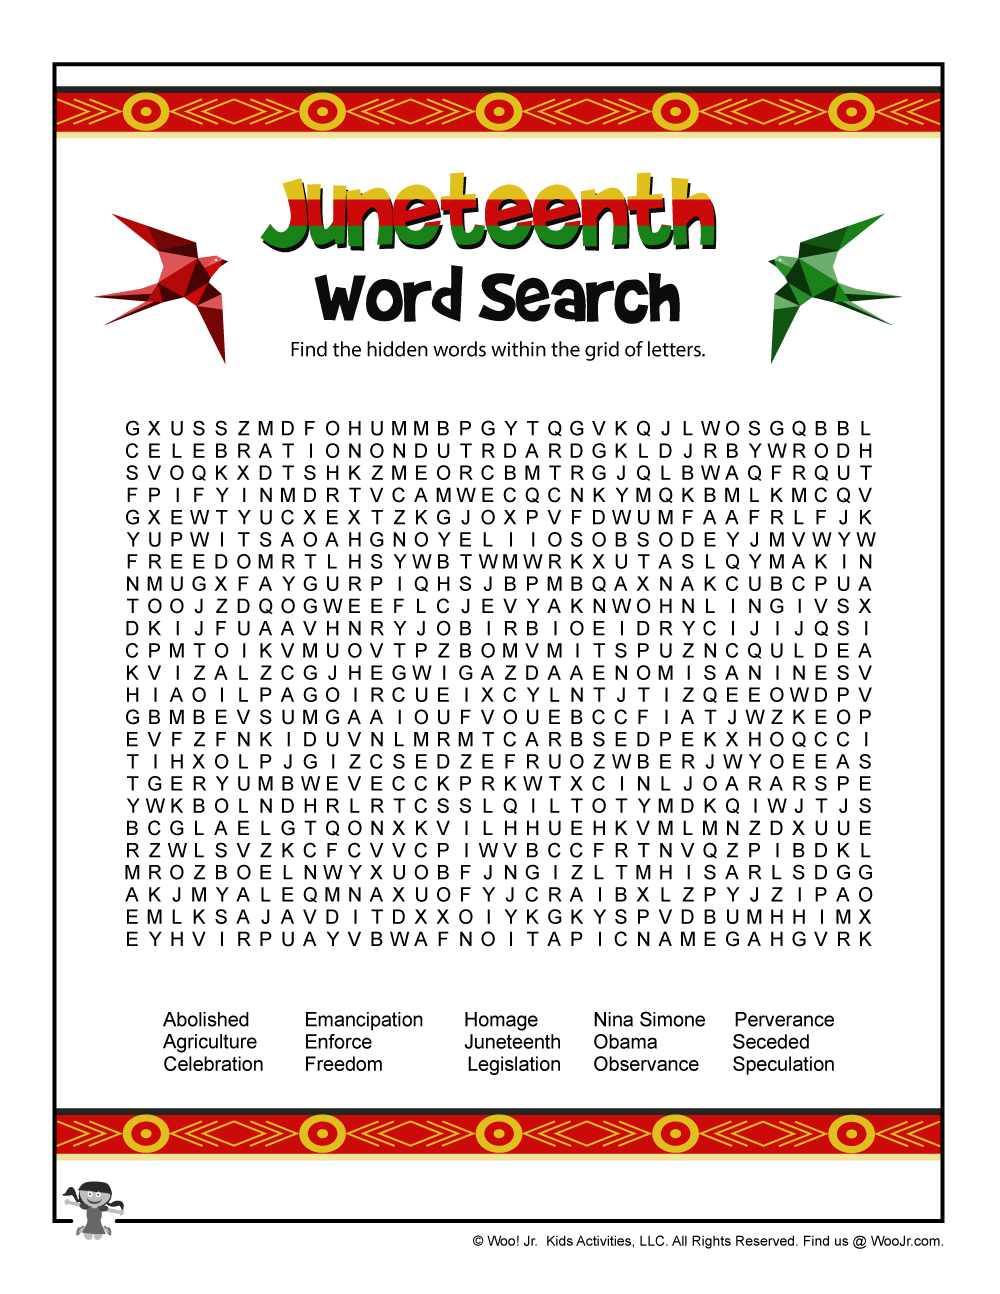 Juneteenth Word Search | Woo! Jr. Kids Activities